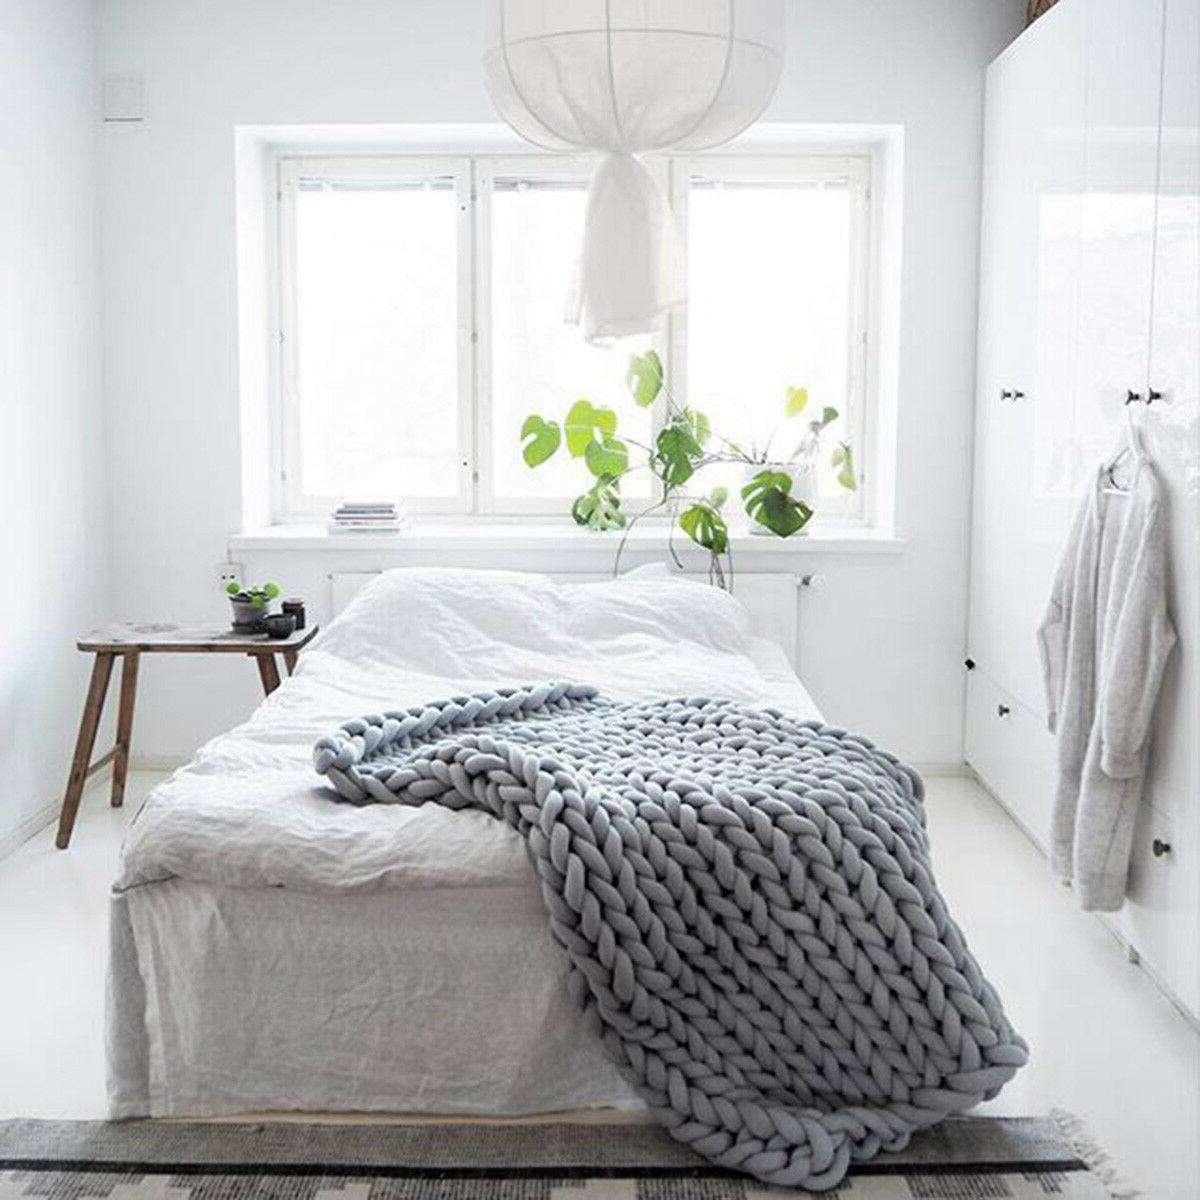 20x20in Handmade Chunky Blanket Throw Carpet Bathroom Rug Cotton❤